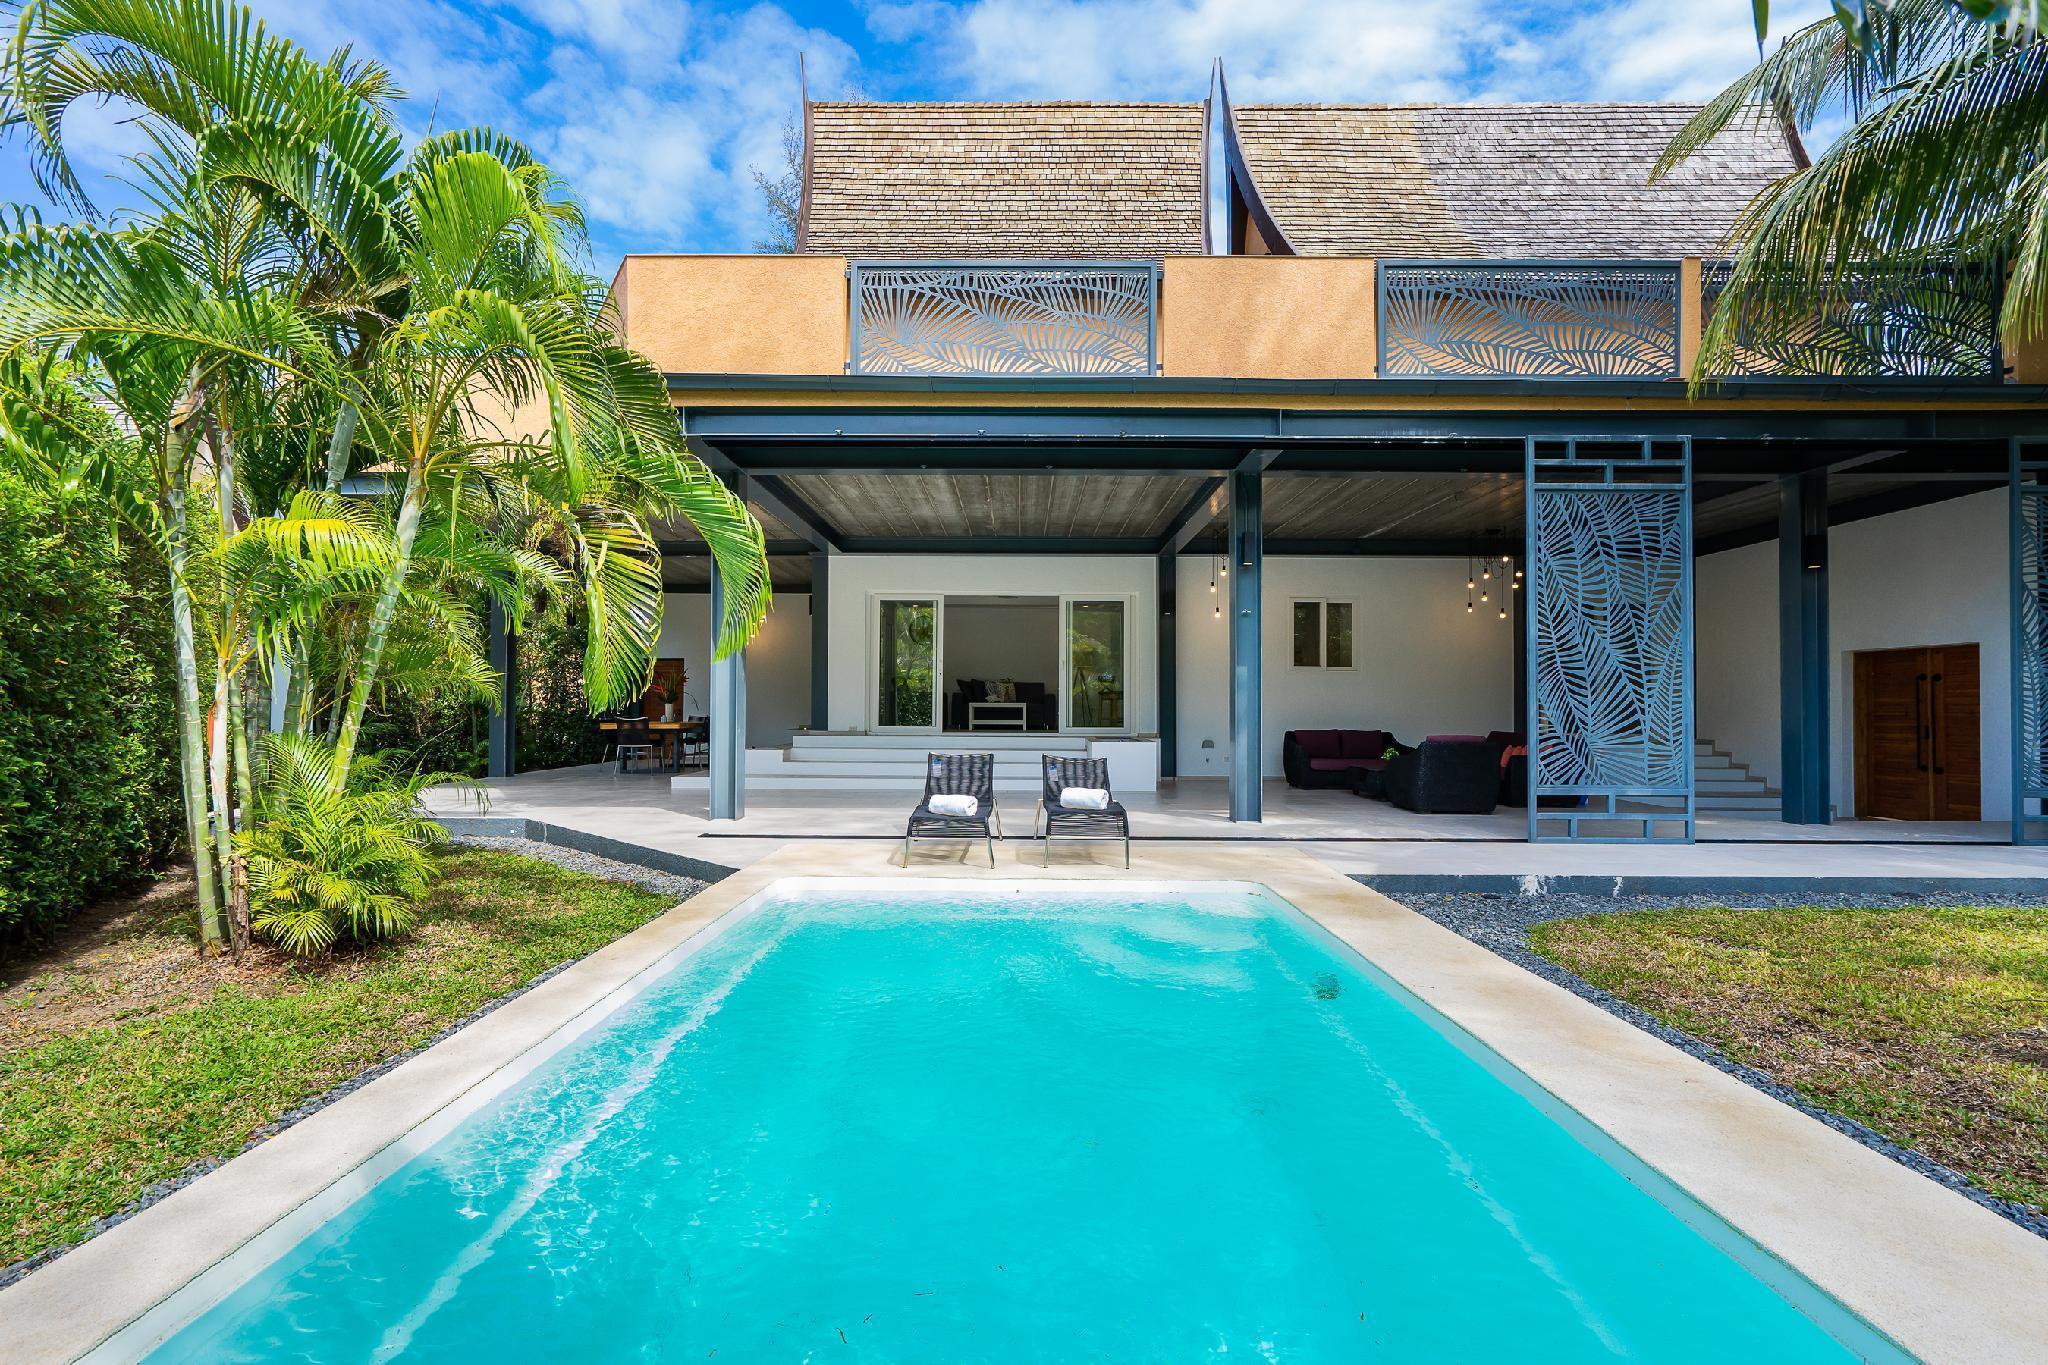 Villa Sunova Private Pool Hotel Managed วิลลา 3 ห้องนอน 3 ห้องน้ำส่วนตัว ขนาด 150 ตร.ม. – คลองสน